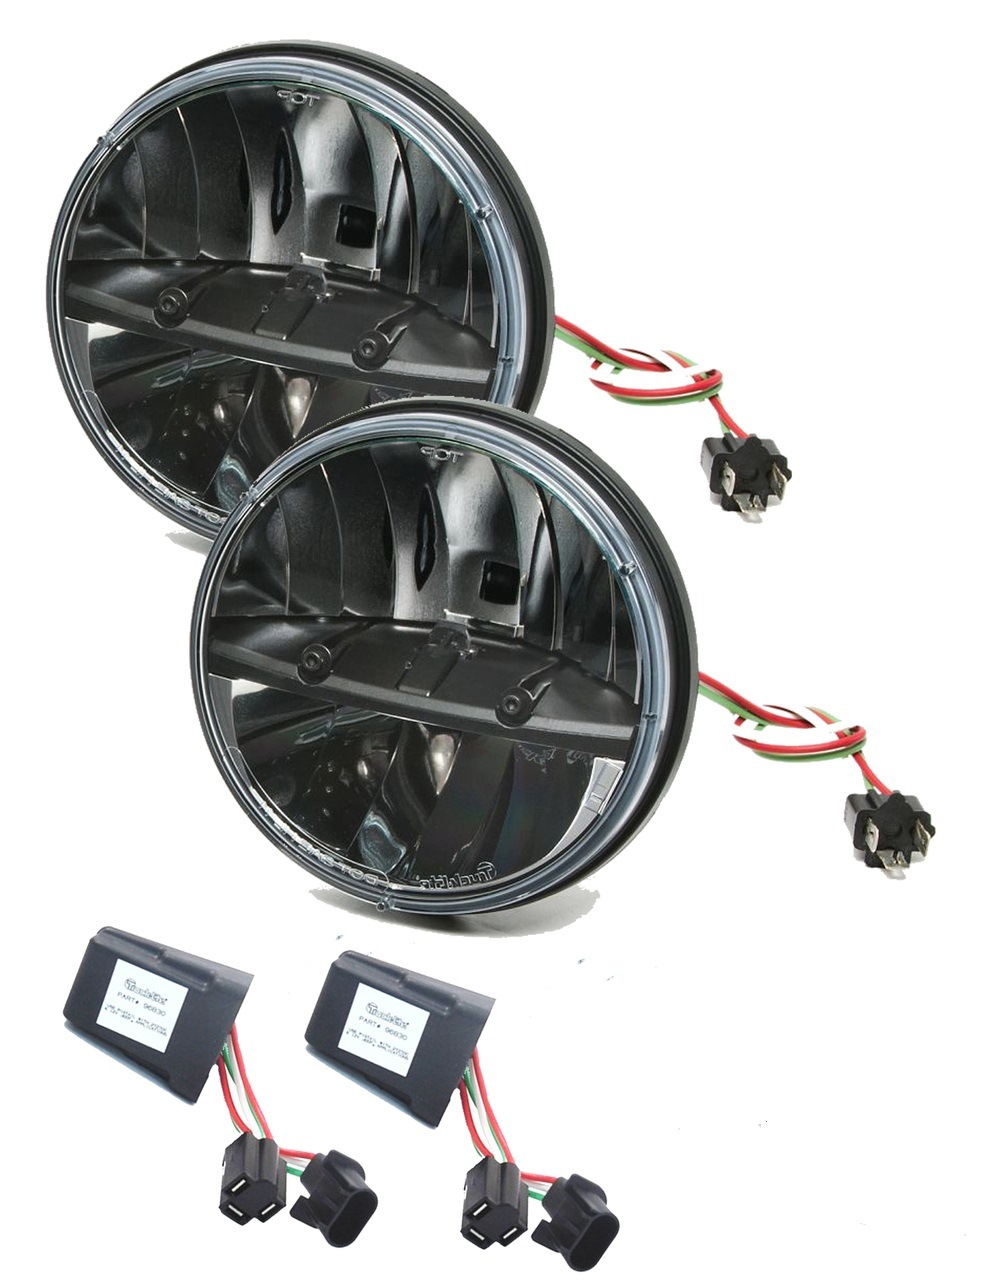 "Truck-Lite 27270C Jeep JK Kit 7"" Round LED Headlight Pair & Anti-Flicker  Harness | eBay"